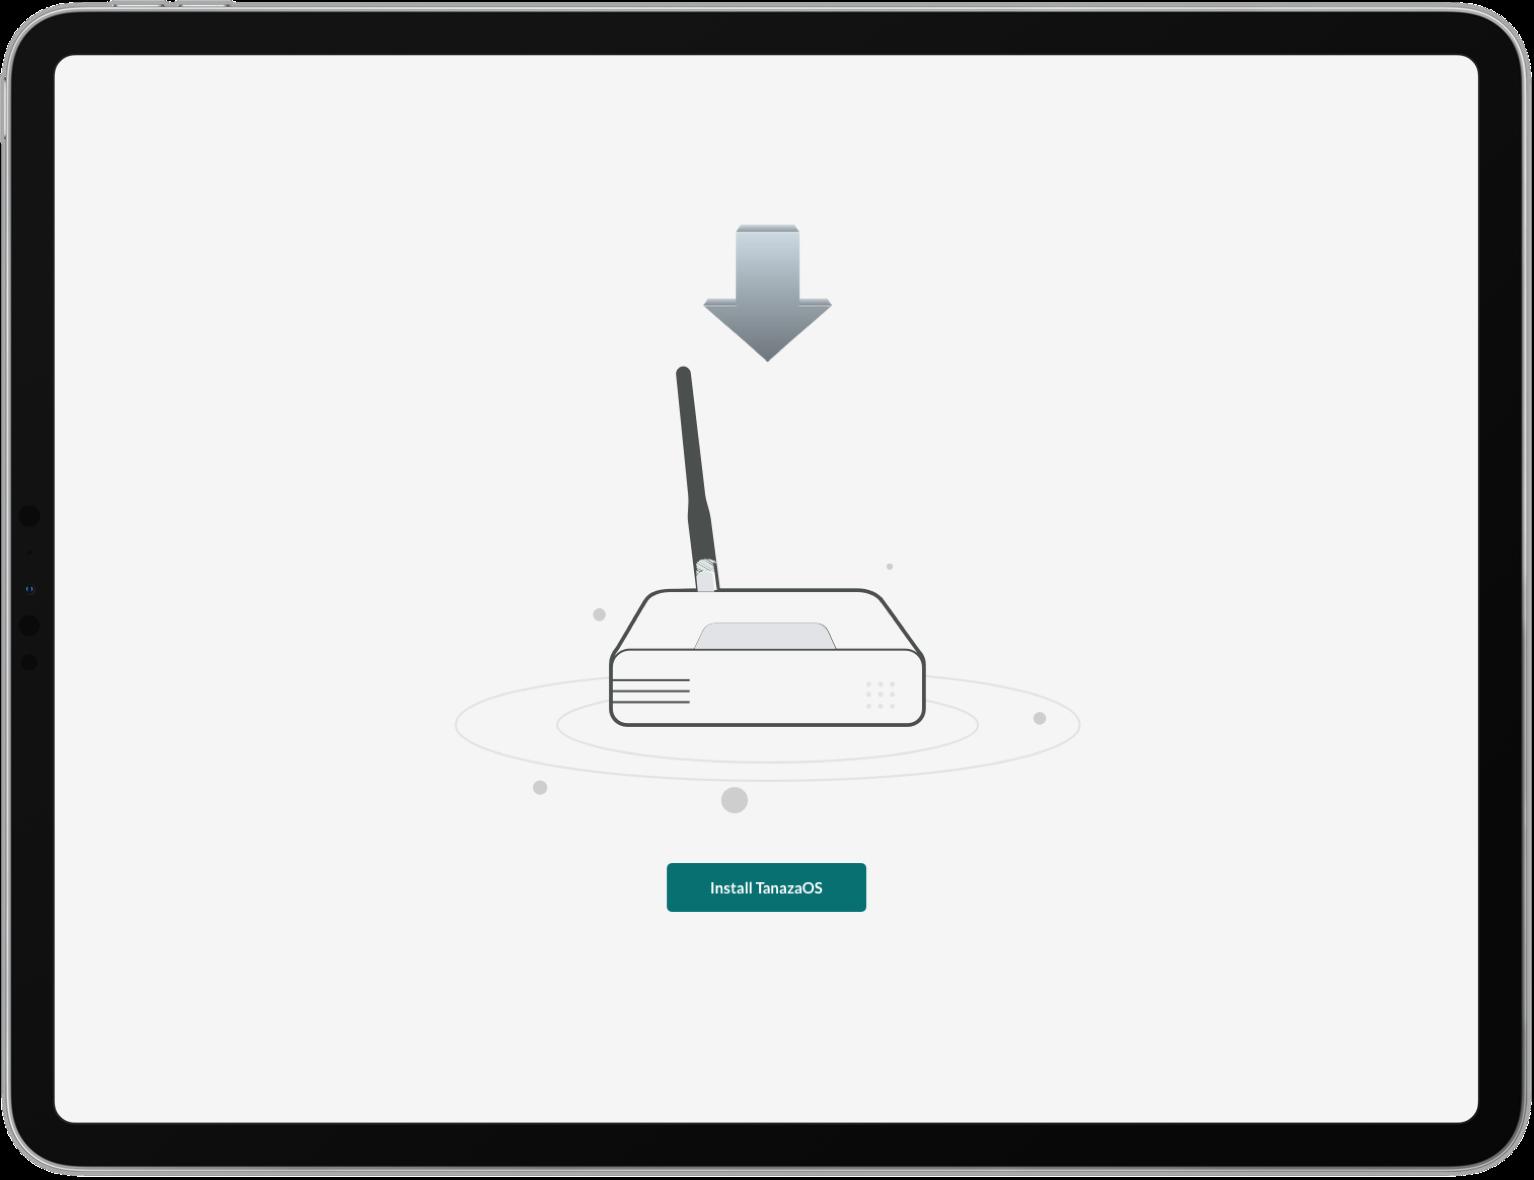 TanazaOS web interface - list of WiFi SSID